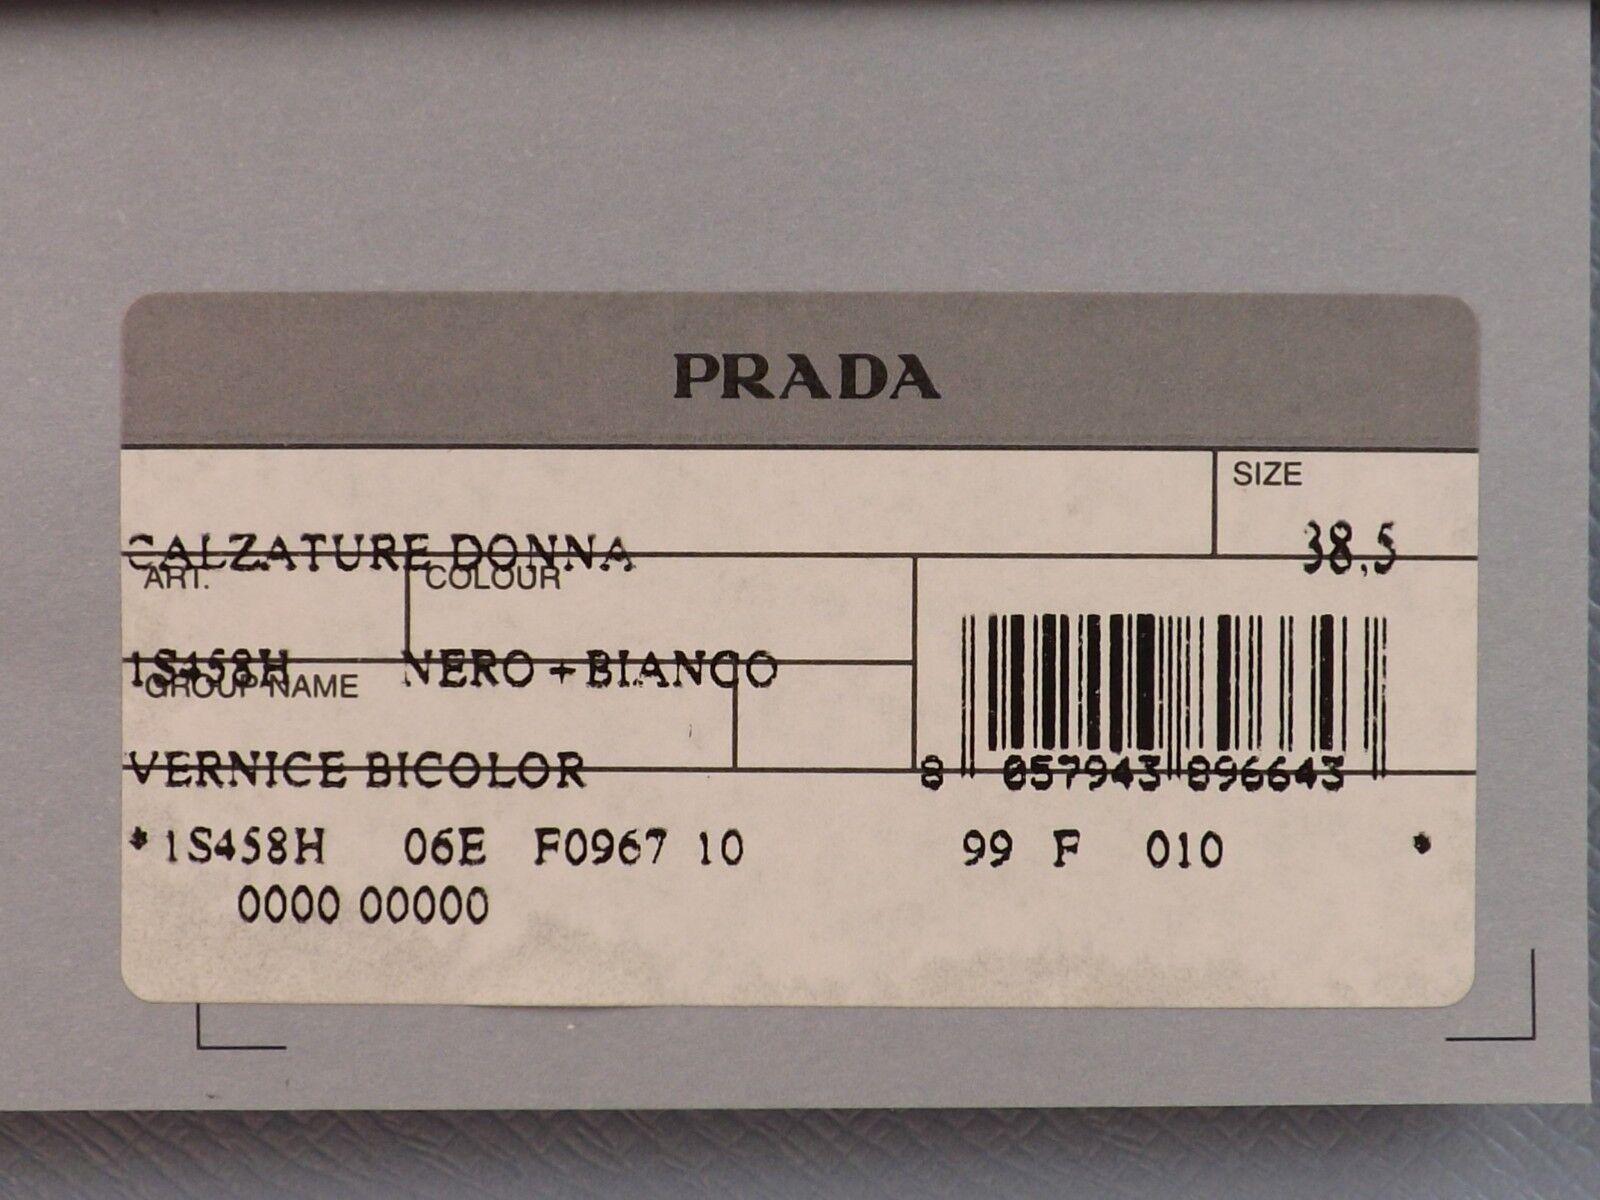 Nuevo En Caja Blanco Prada Charol Negro Blanco Caja Hebilla arco antideslizante en pisos 37 Italia f2693d